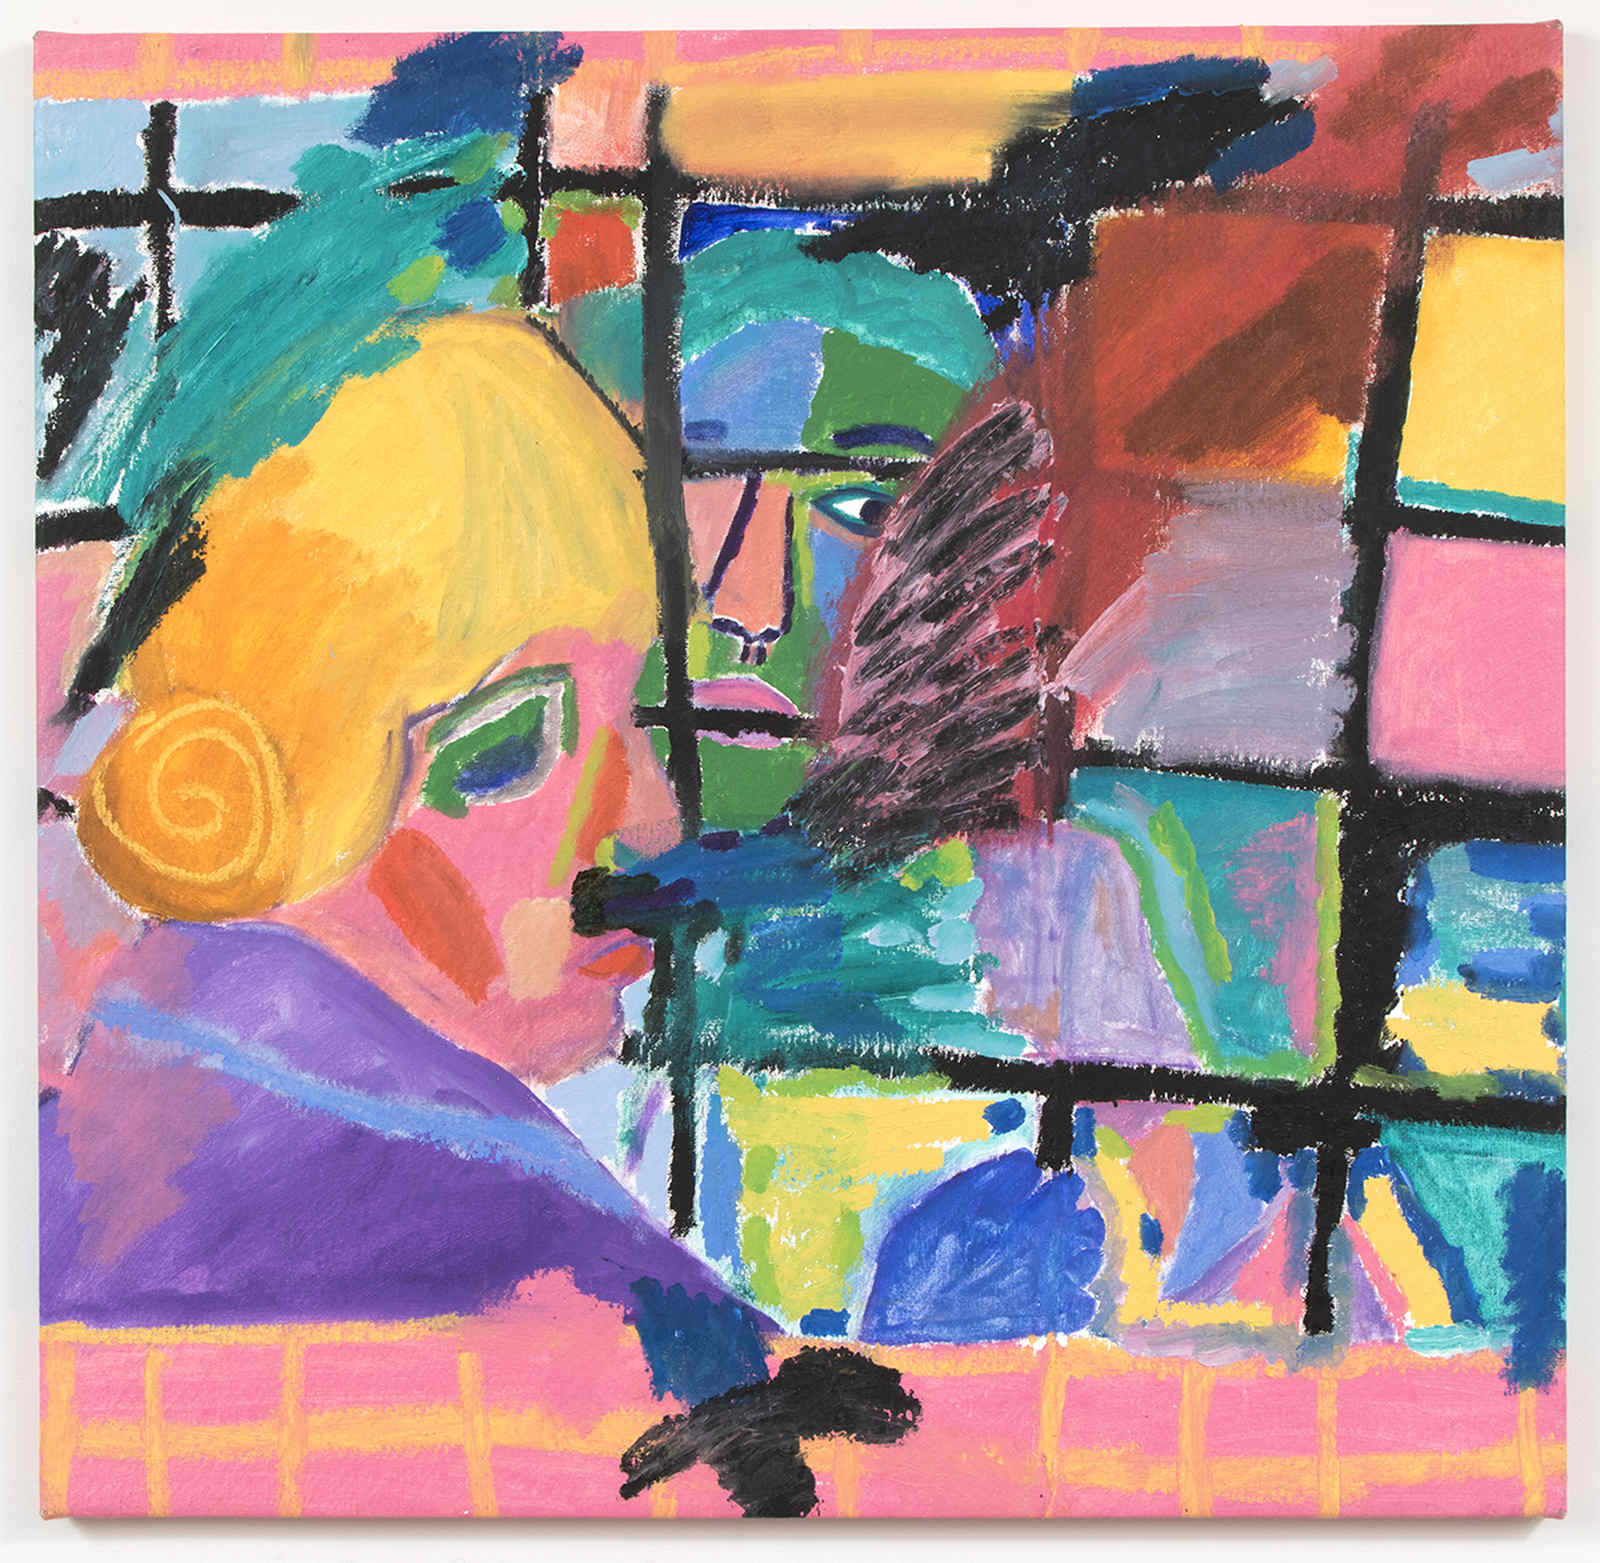 Jennifer Sullivan.Pickpocket #1 (Film Still), 2015, oil on canvas, 31 x 32 inches (1)